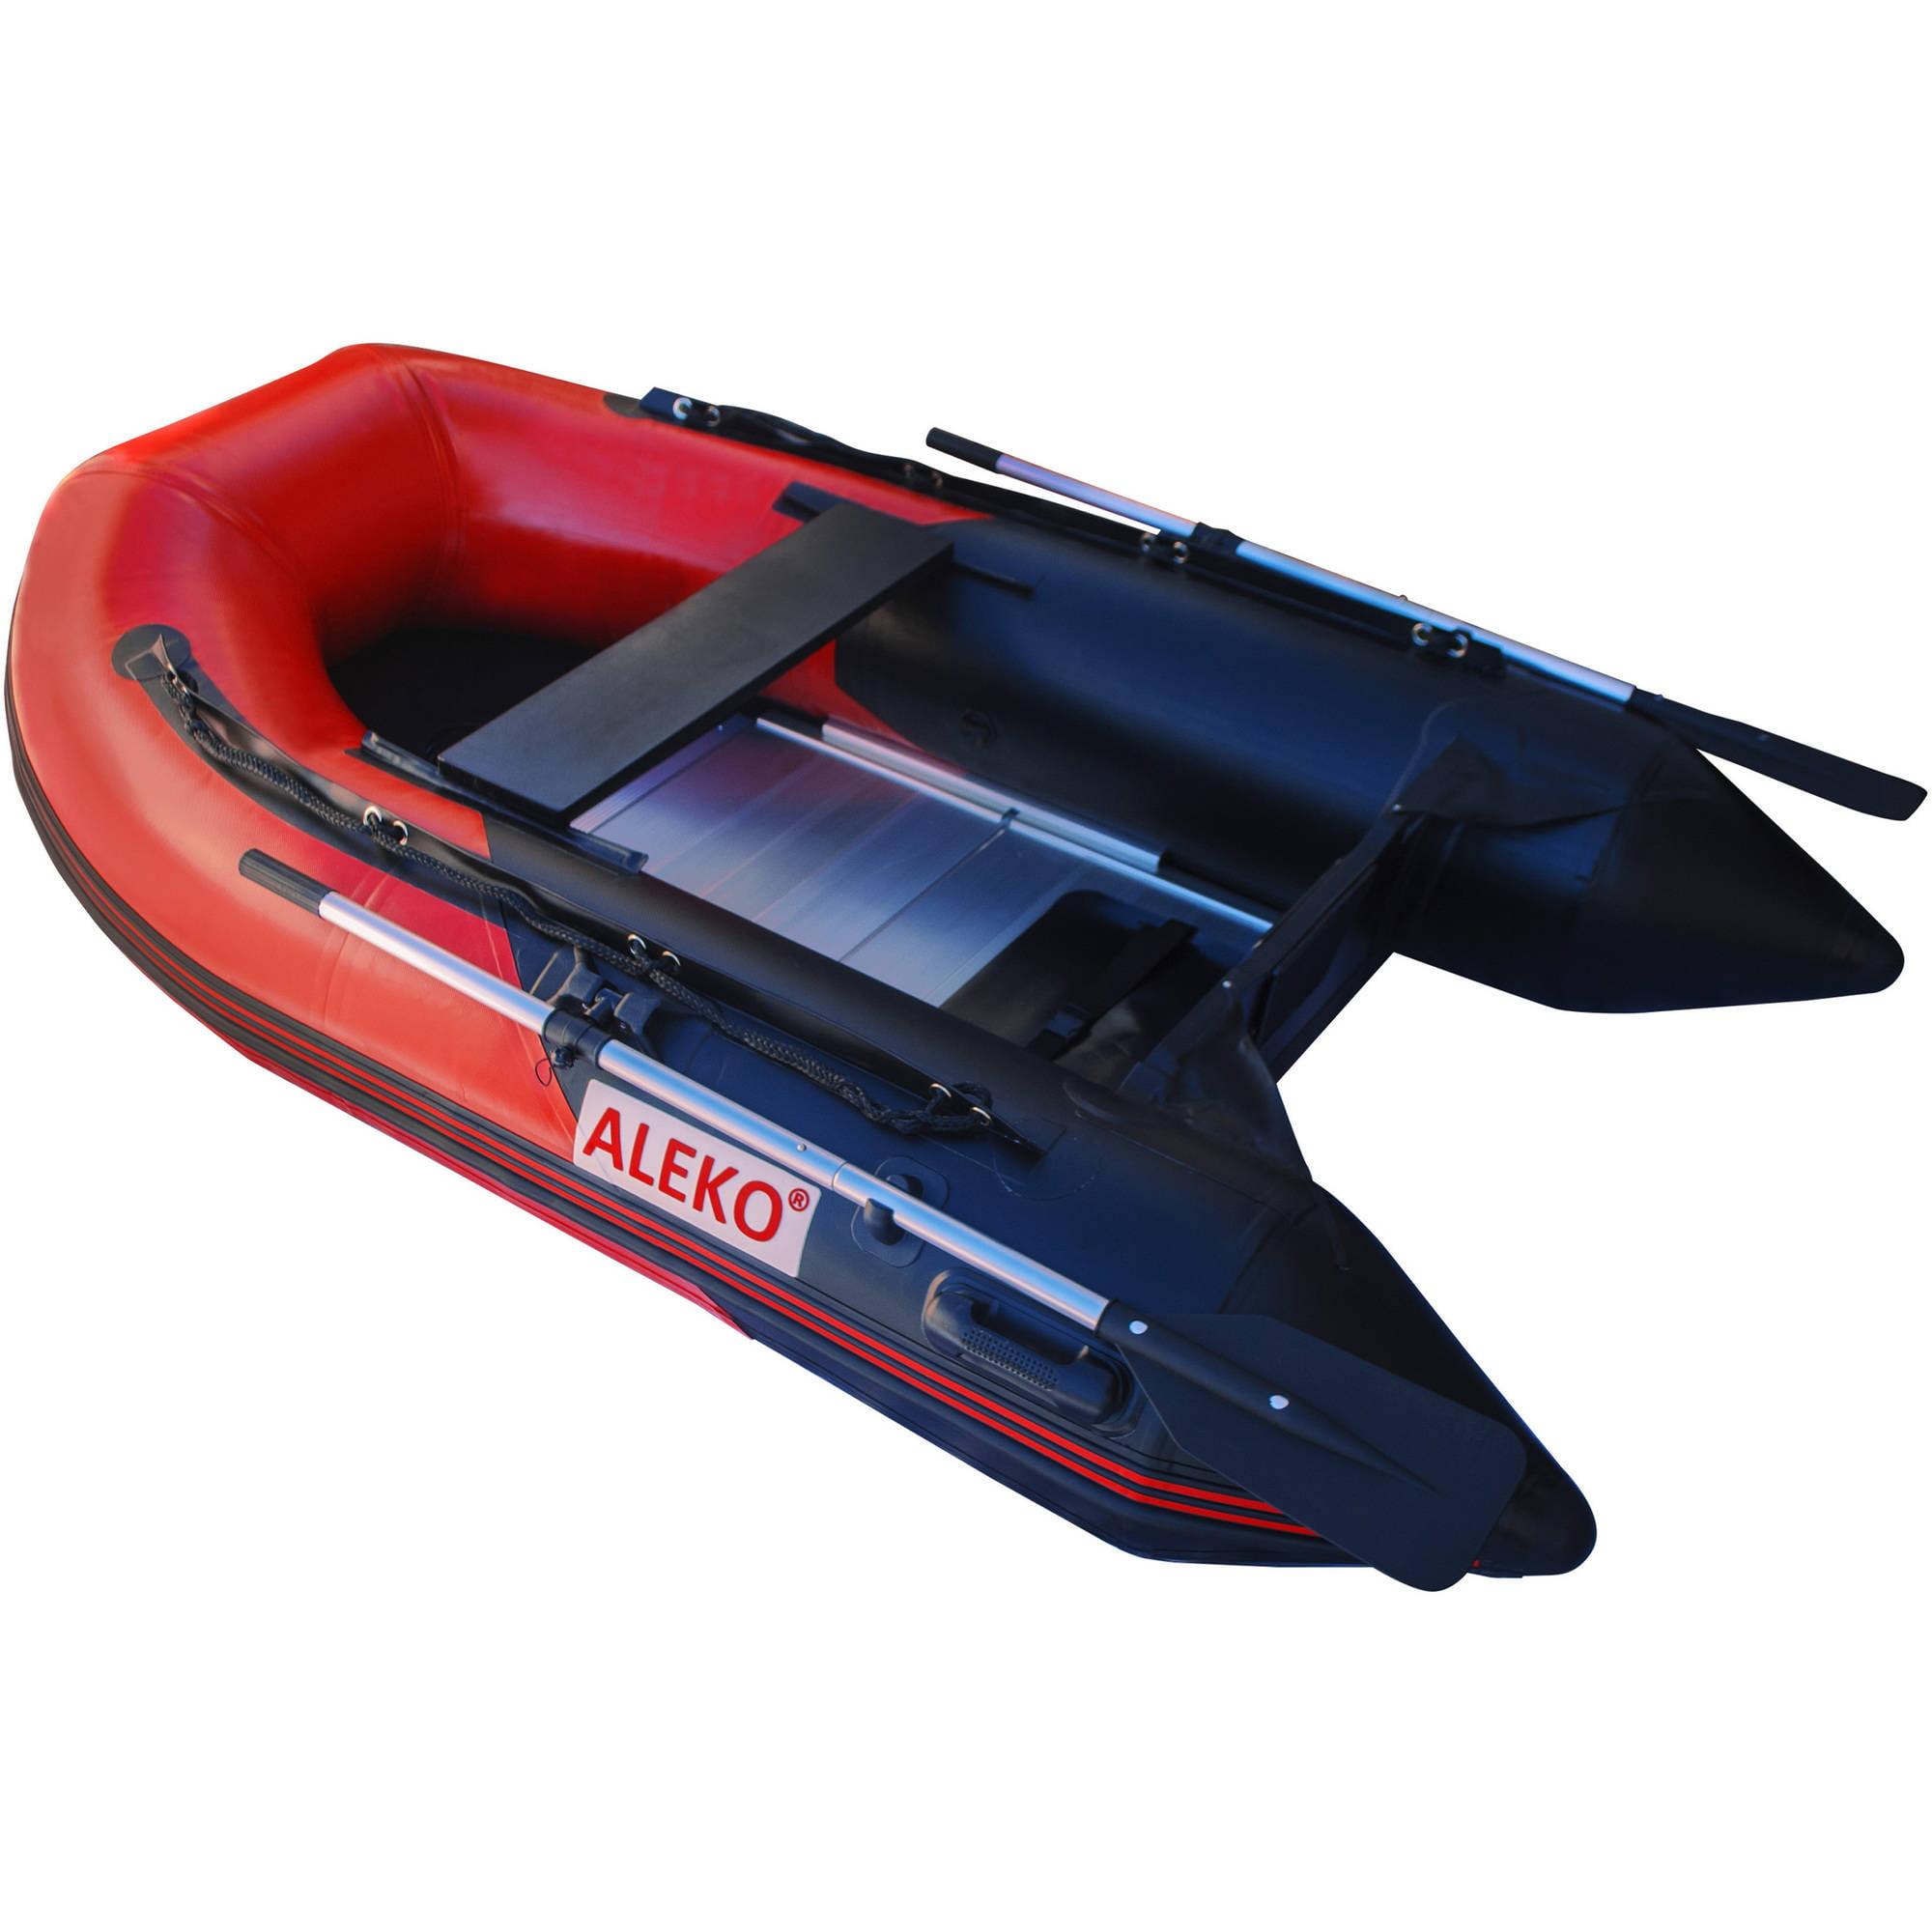 ALEKO Inflatable Boat - Aluminum Floor - 8.4 Feet - Red and Black